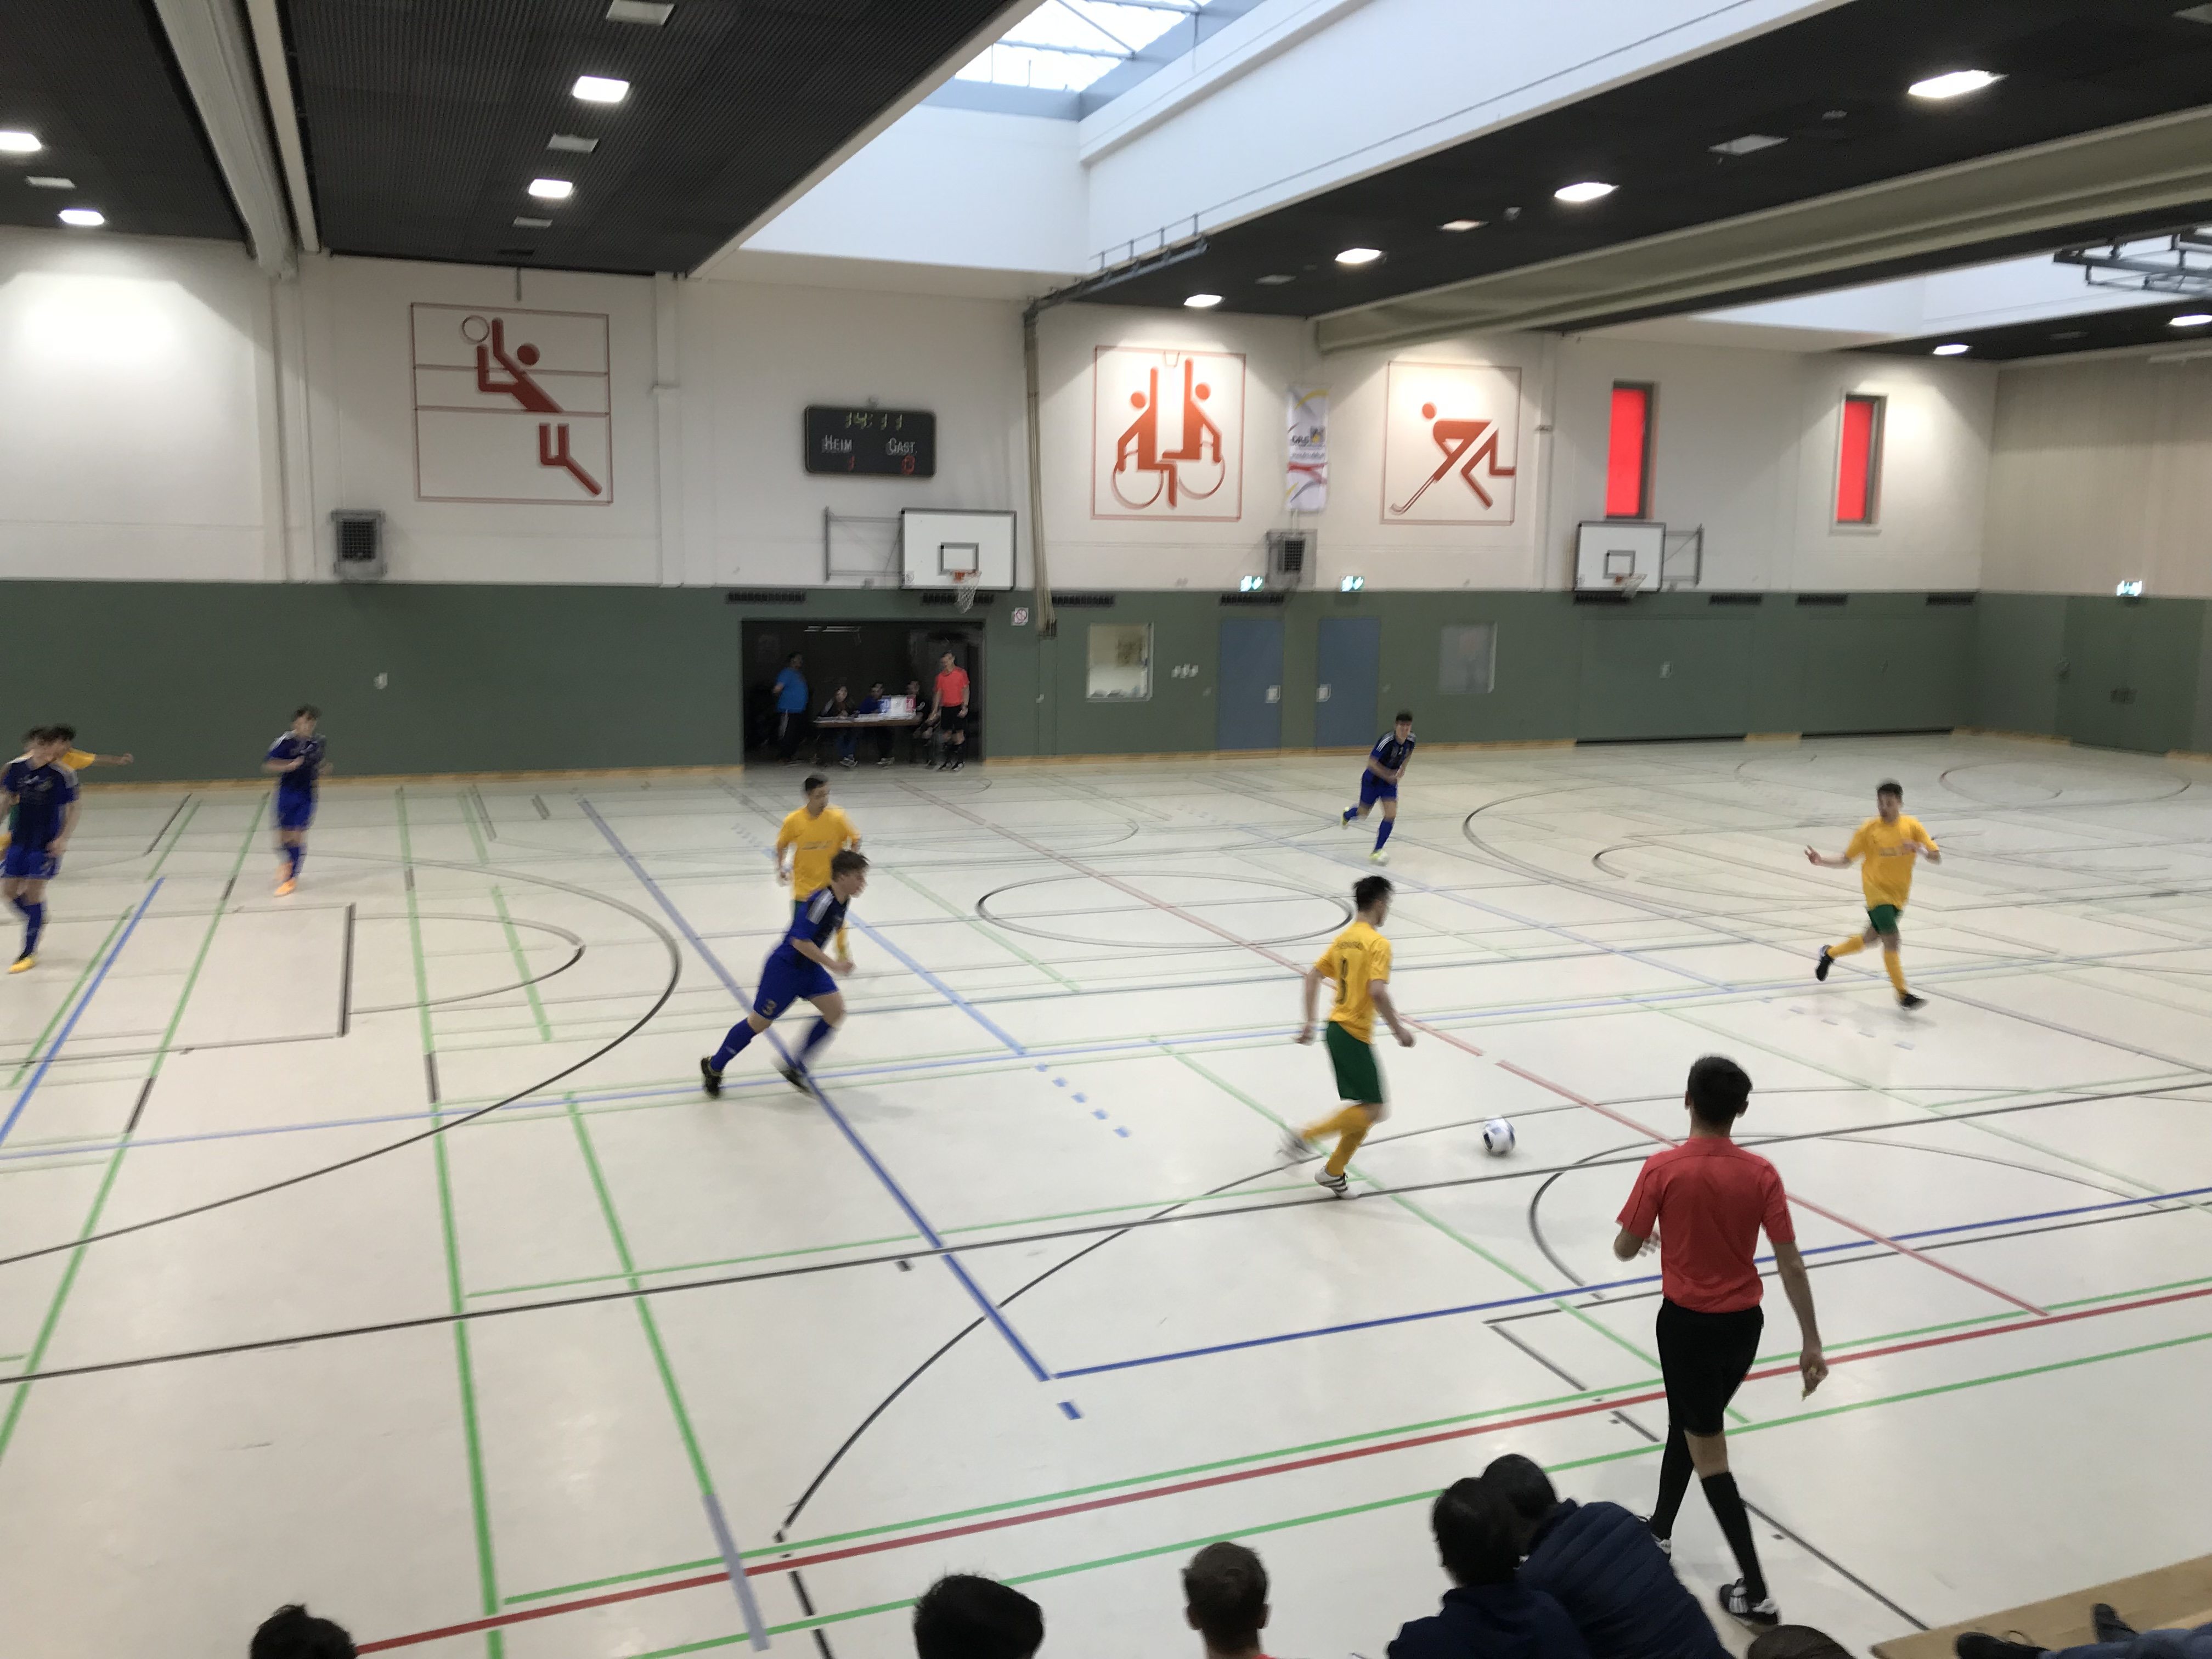 AJ Futsal-Hallenturnier in Klarenthal